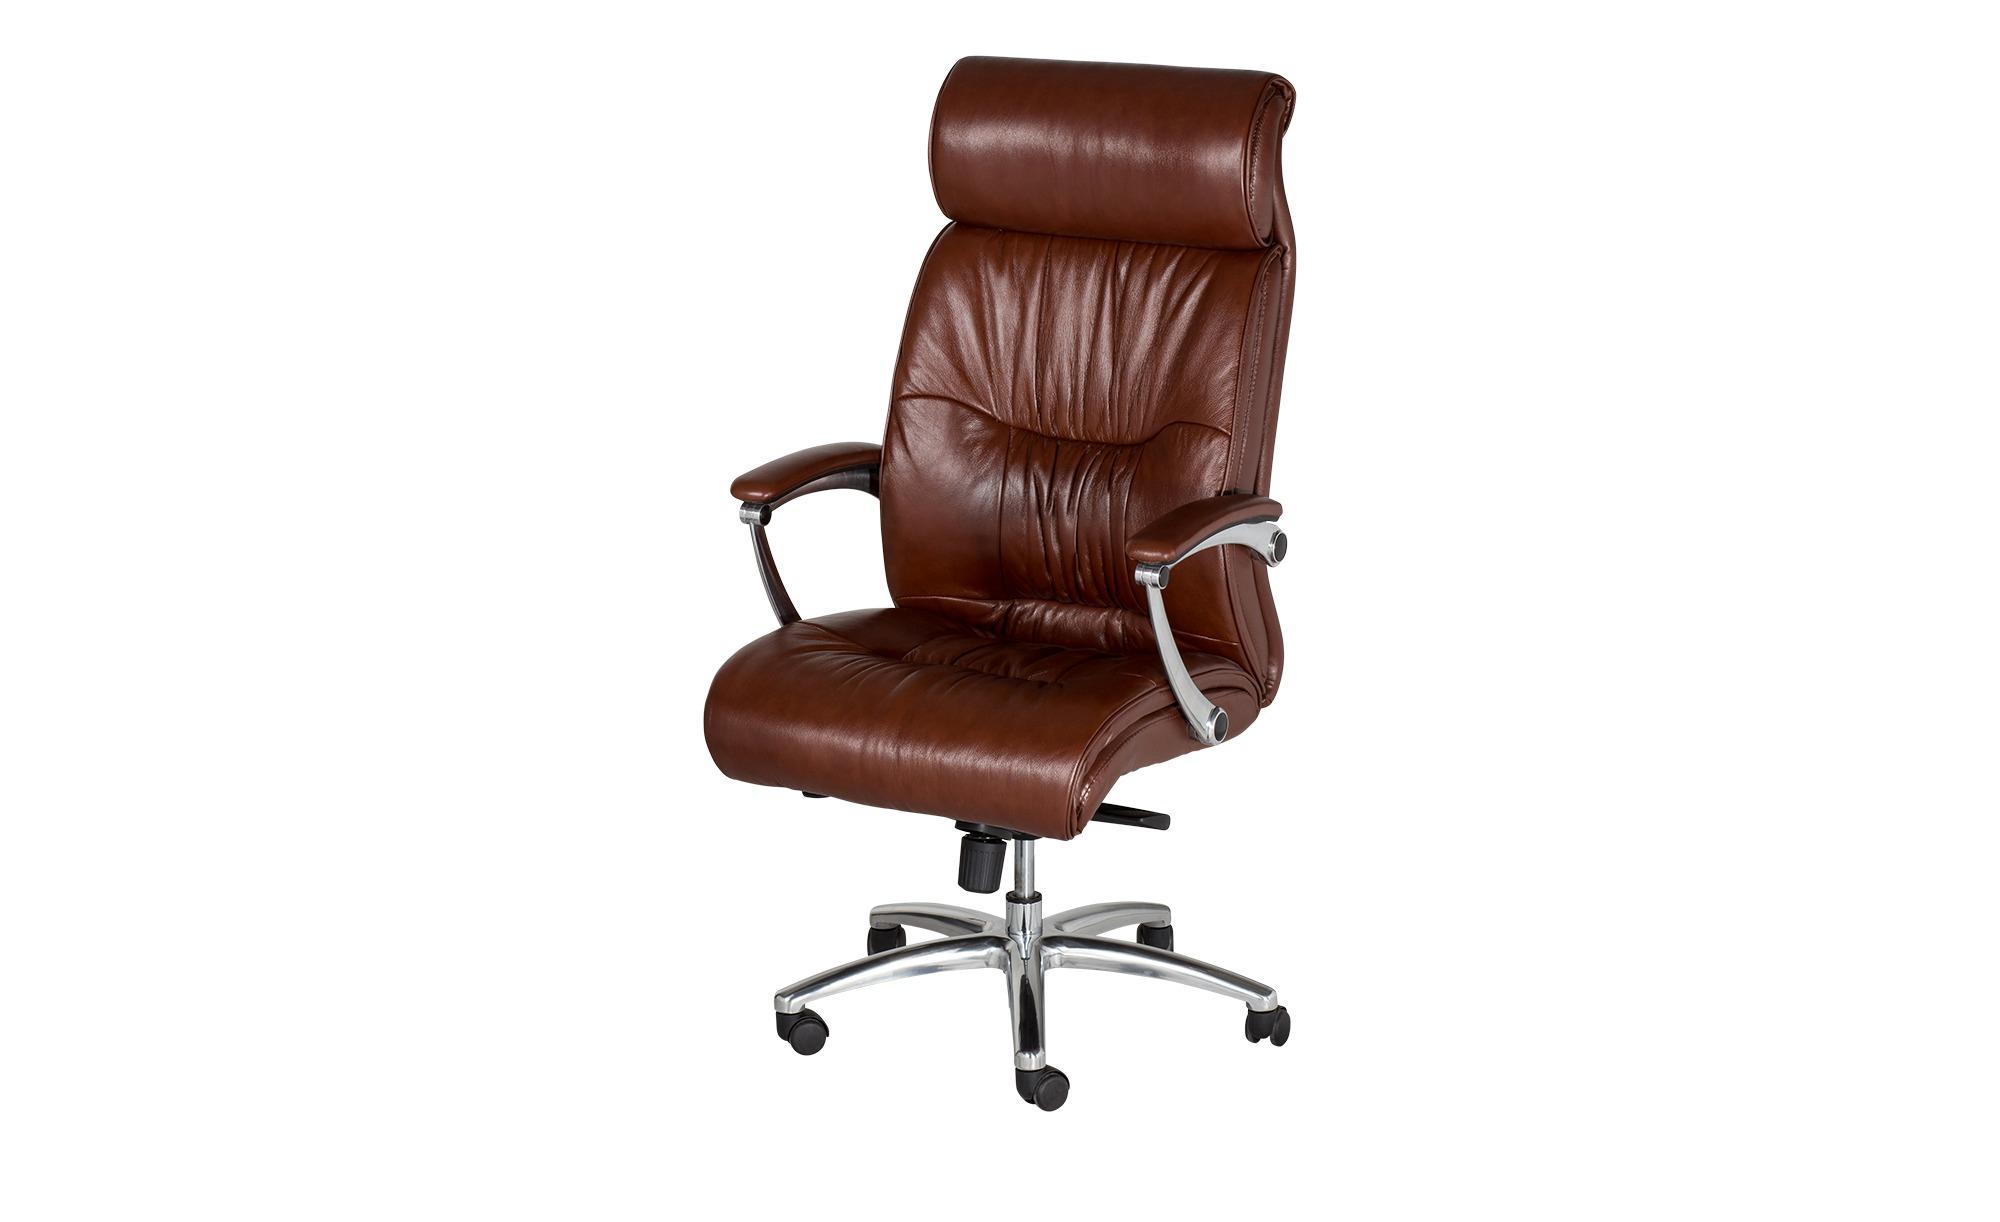 leder chefsessel braun bei m bel kraft online kaufen. Black Bedroom Furniture Sets. Home Design Ideas